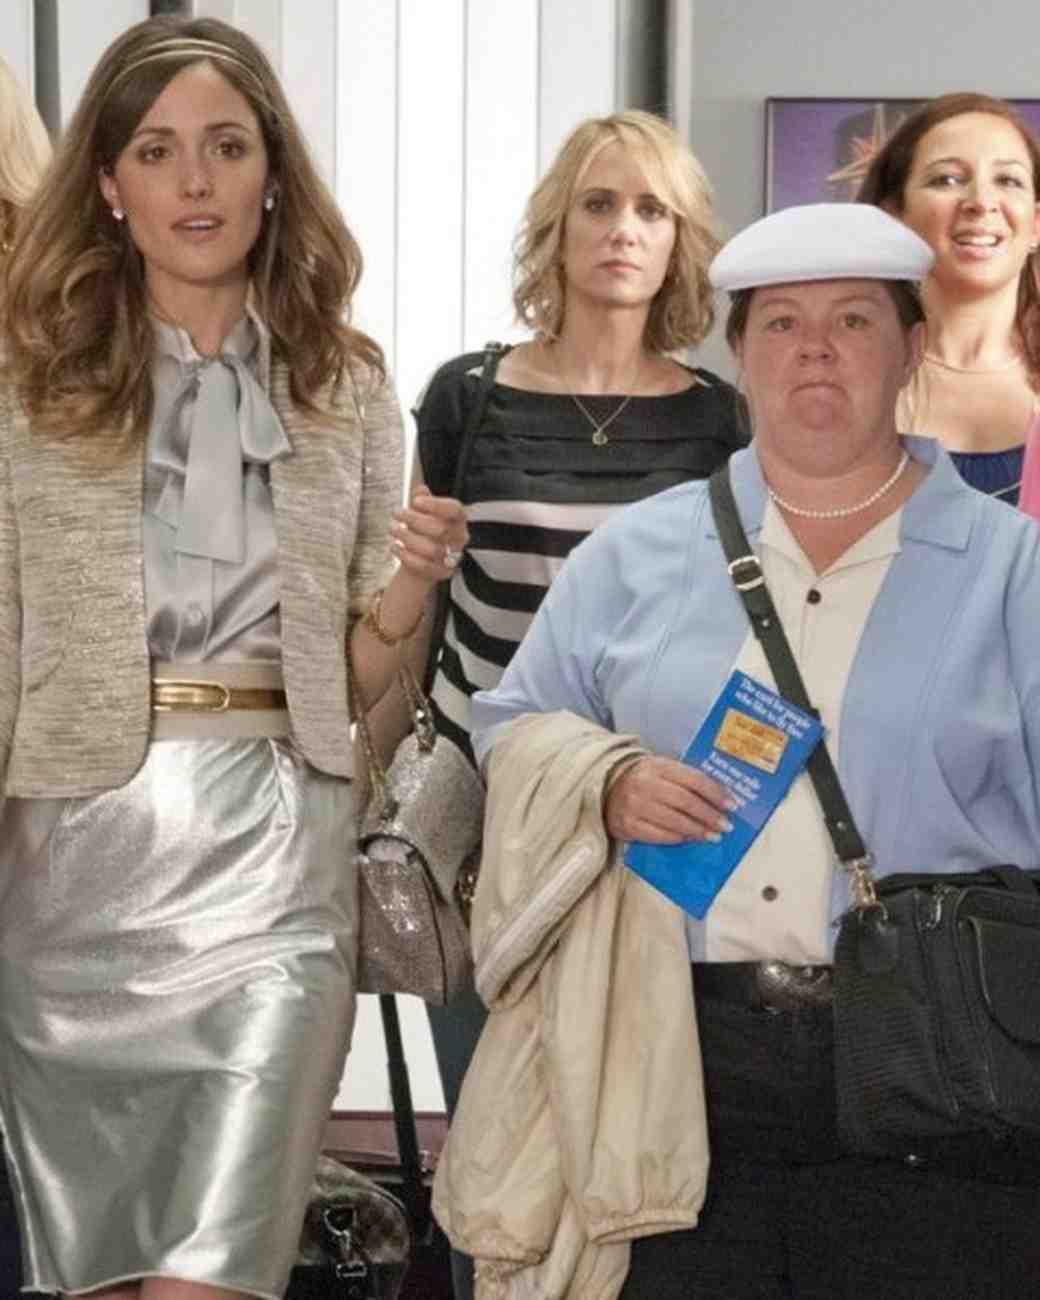 bridesmaids-airport-movie-0517